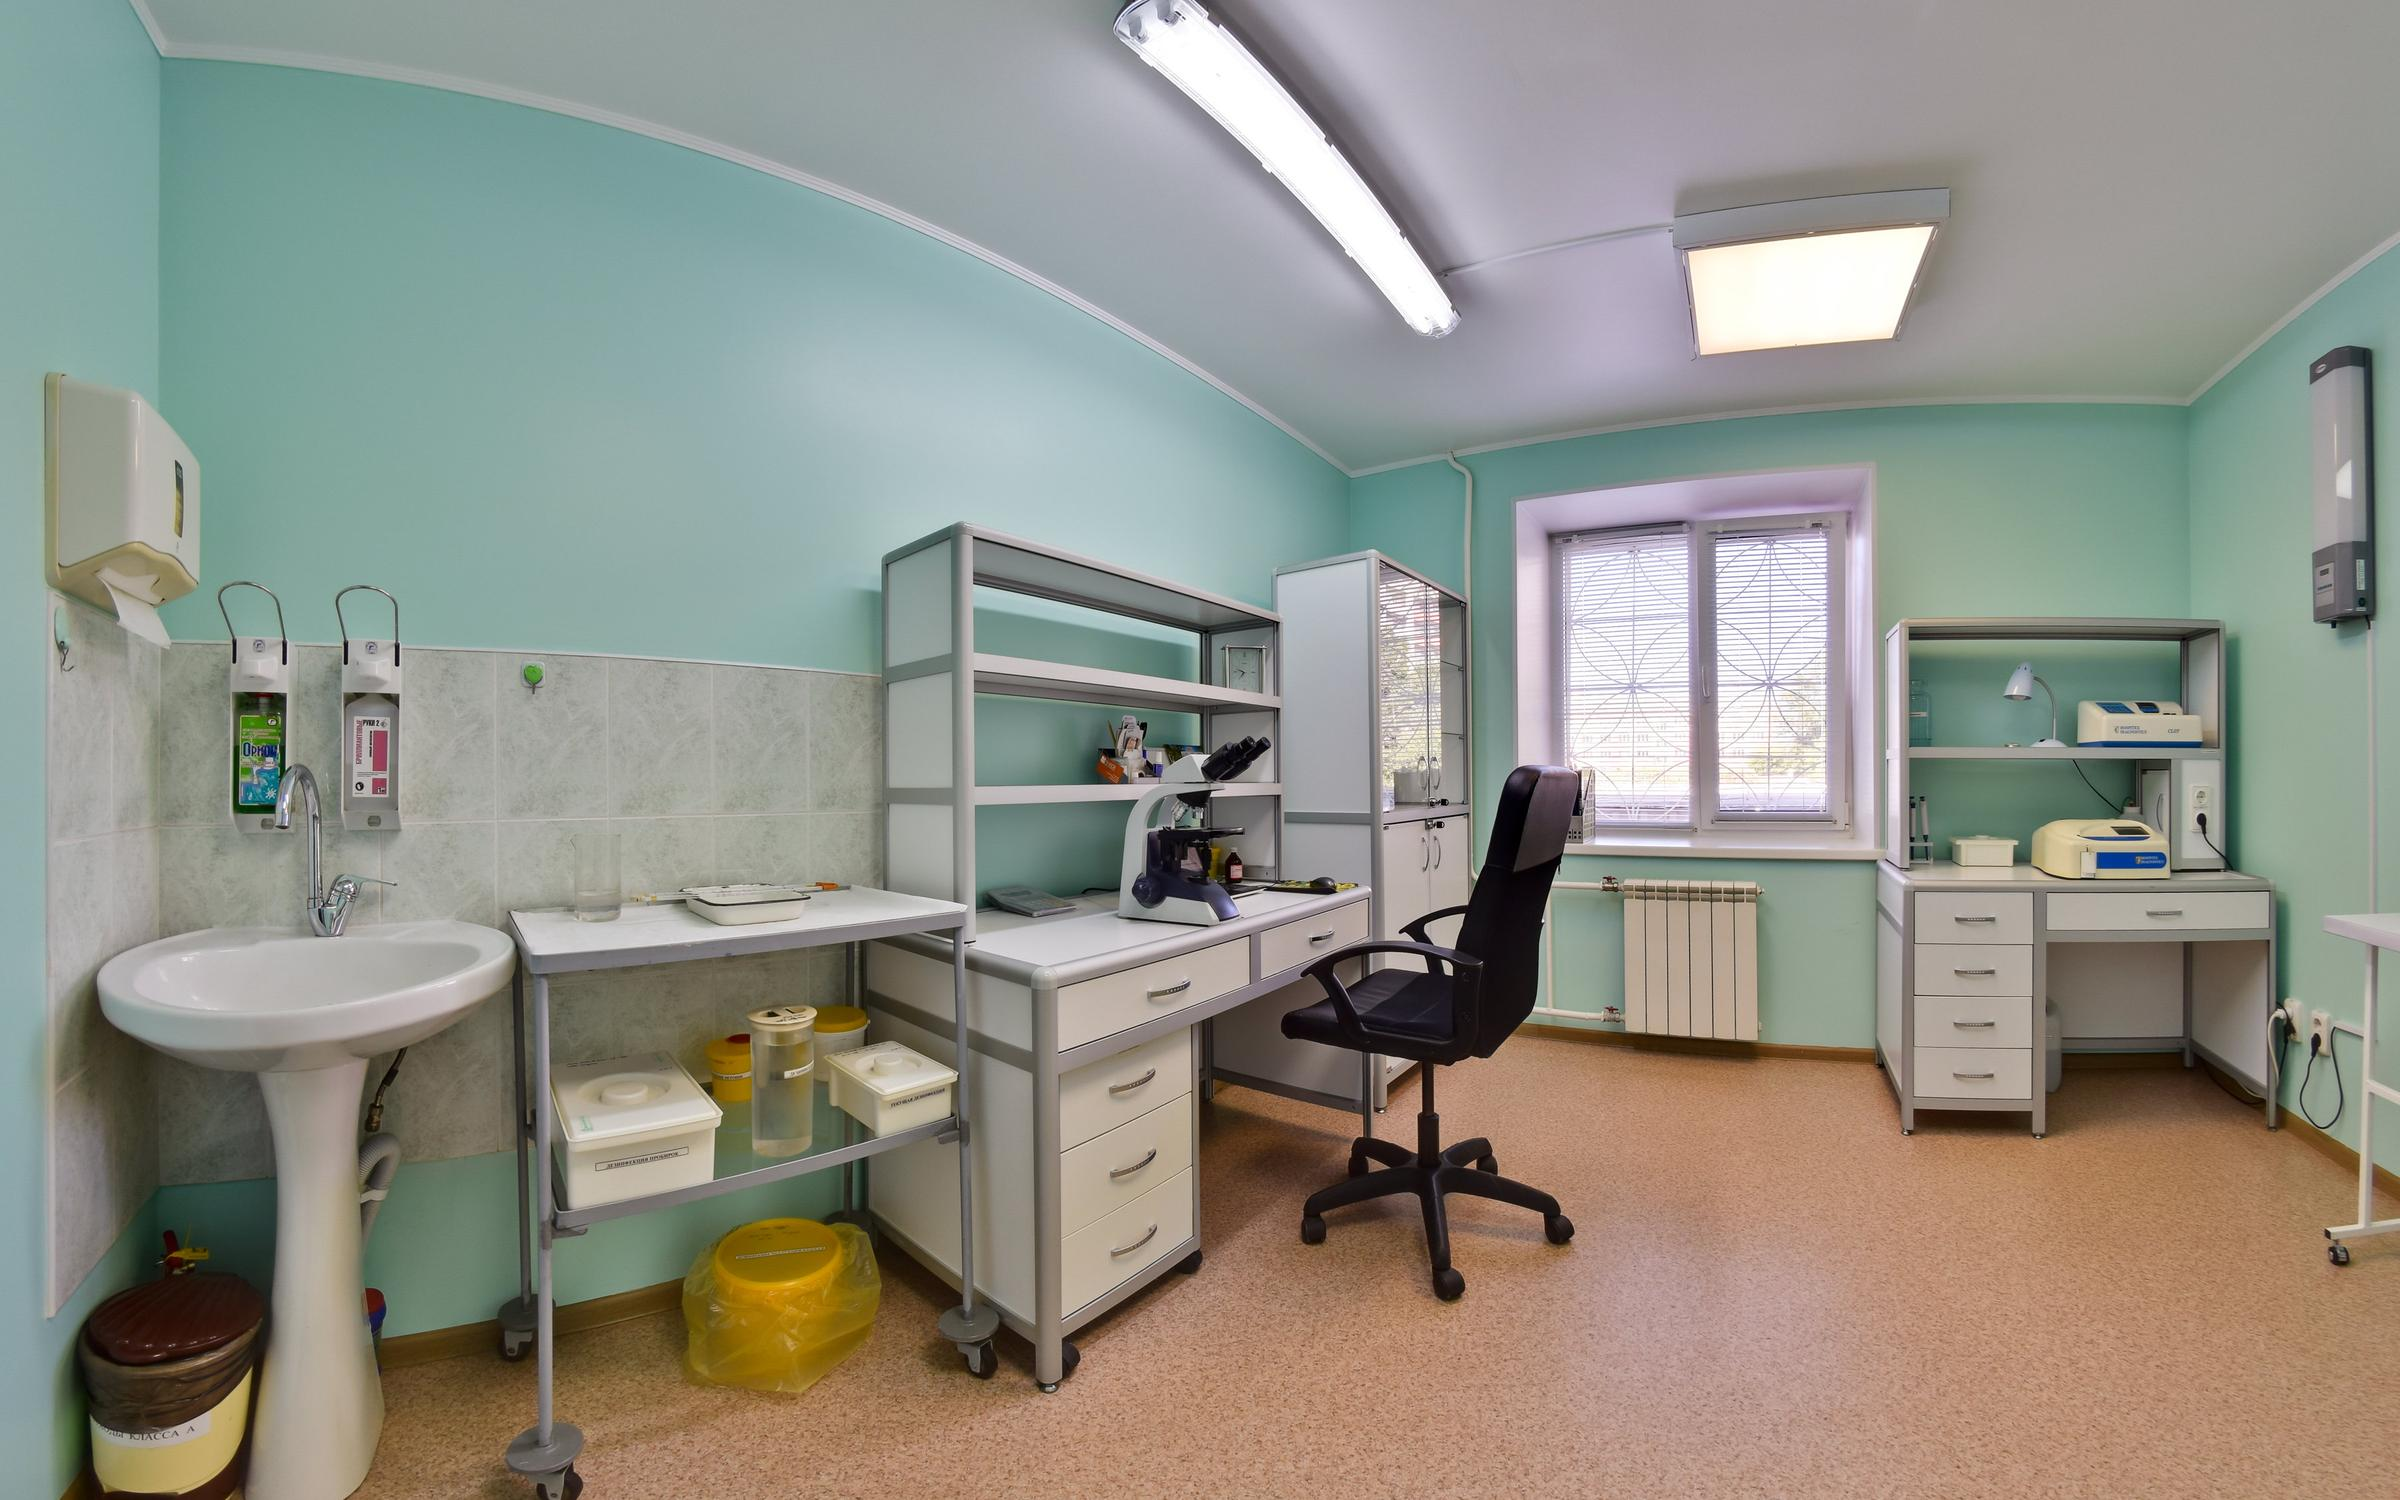 фотография Медицинского центра Мифра-Мед